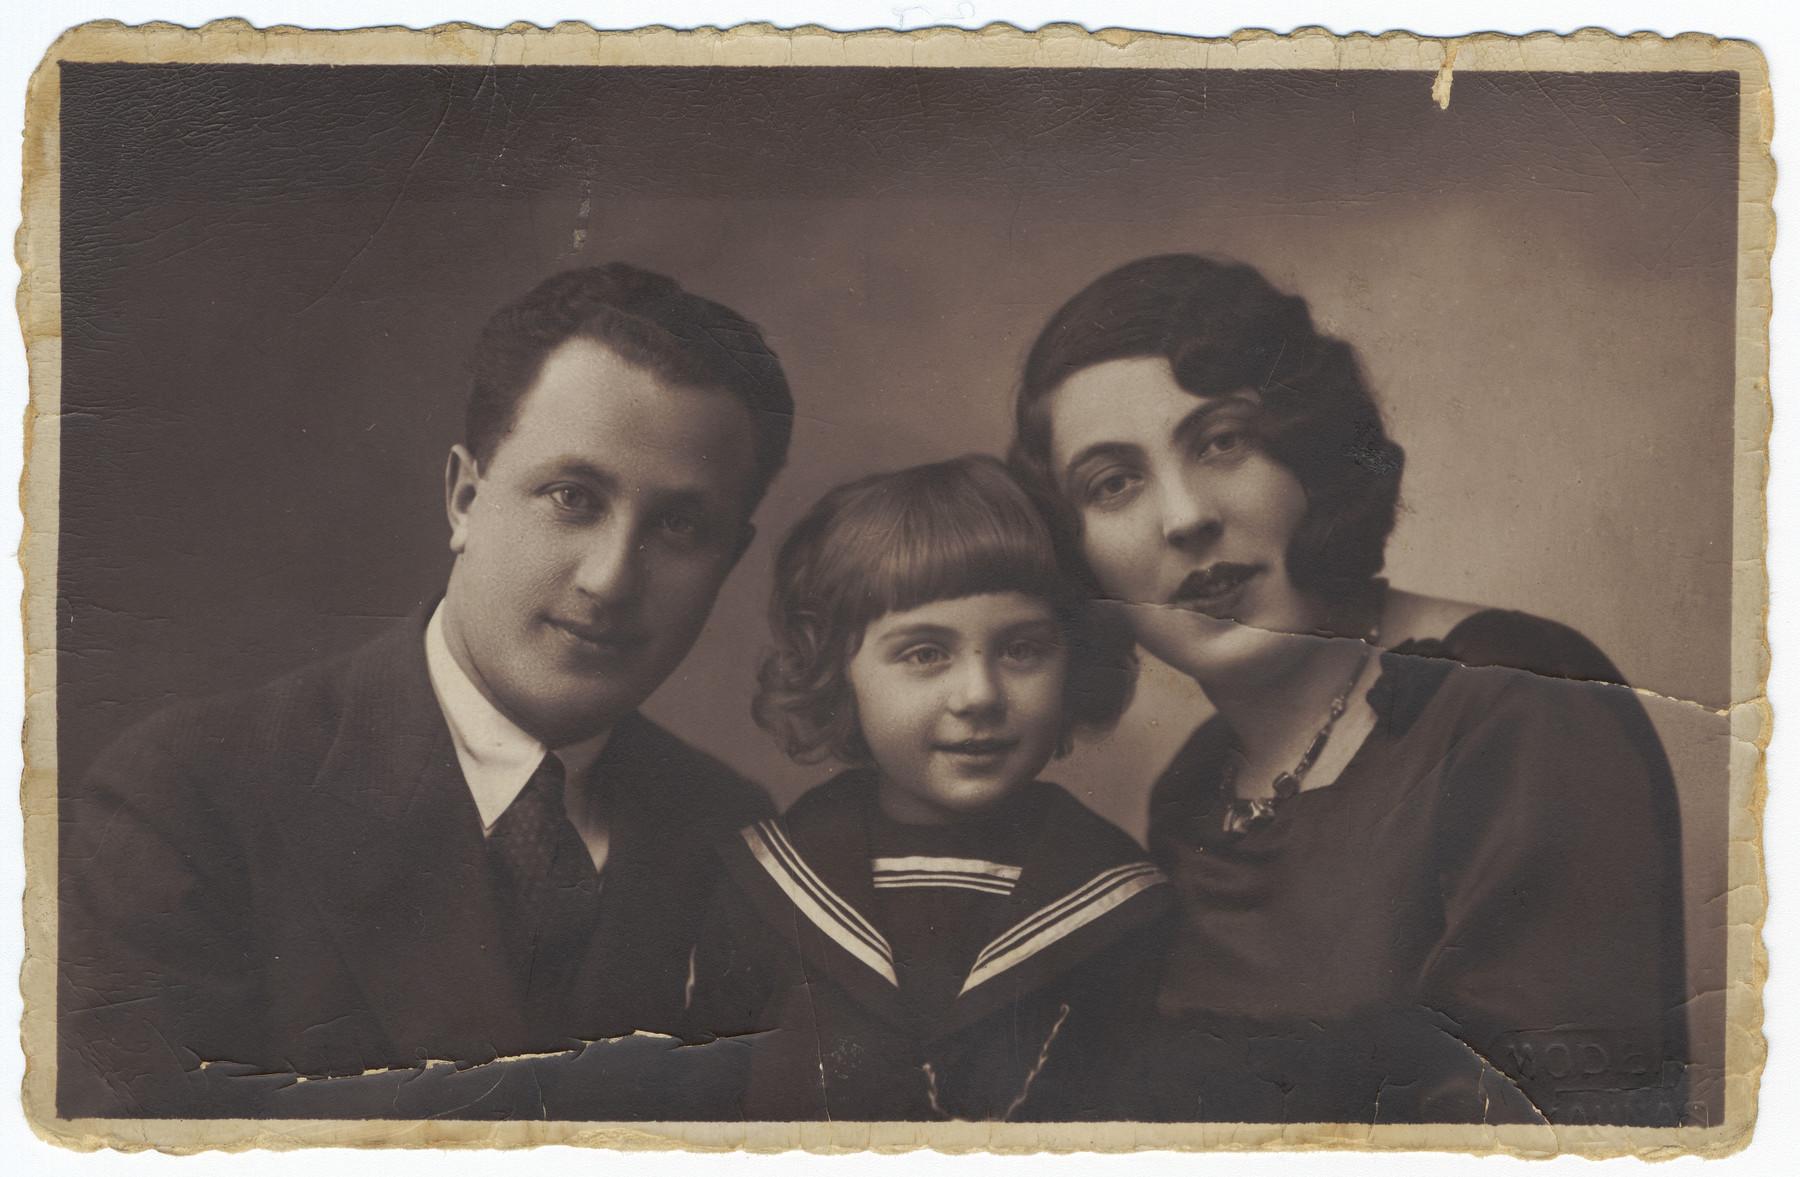 Studio portrait of Salomon, Avram and Rachil Romas, a Lithuanian-Jewish family.